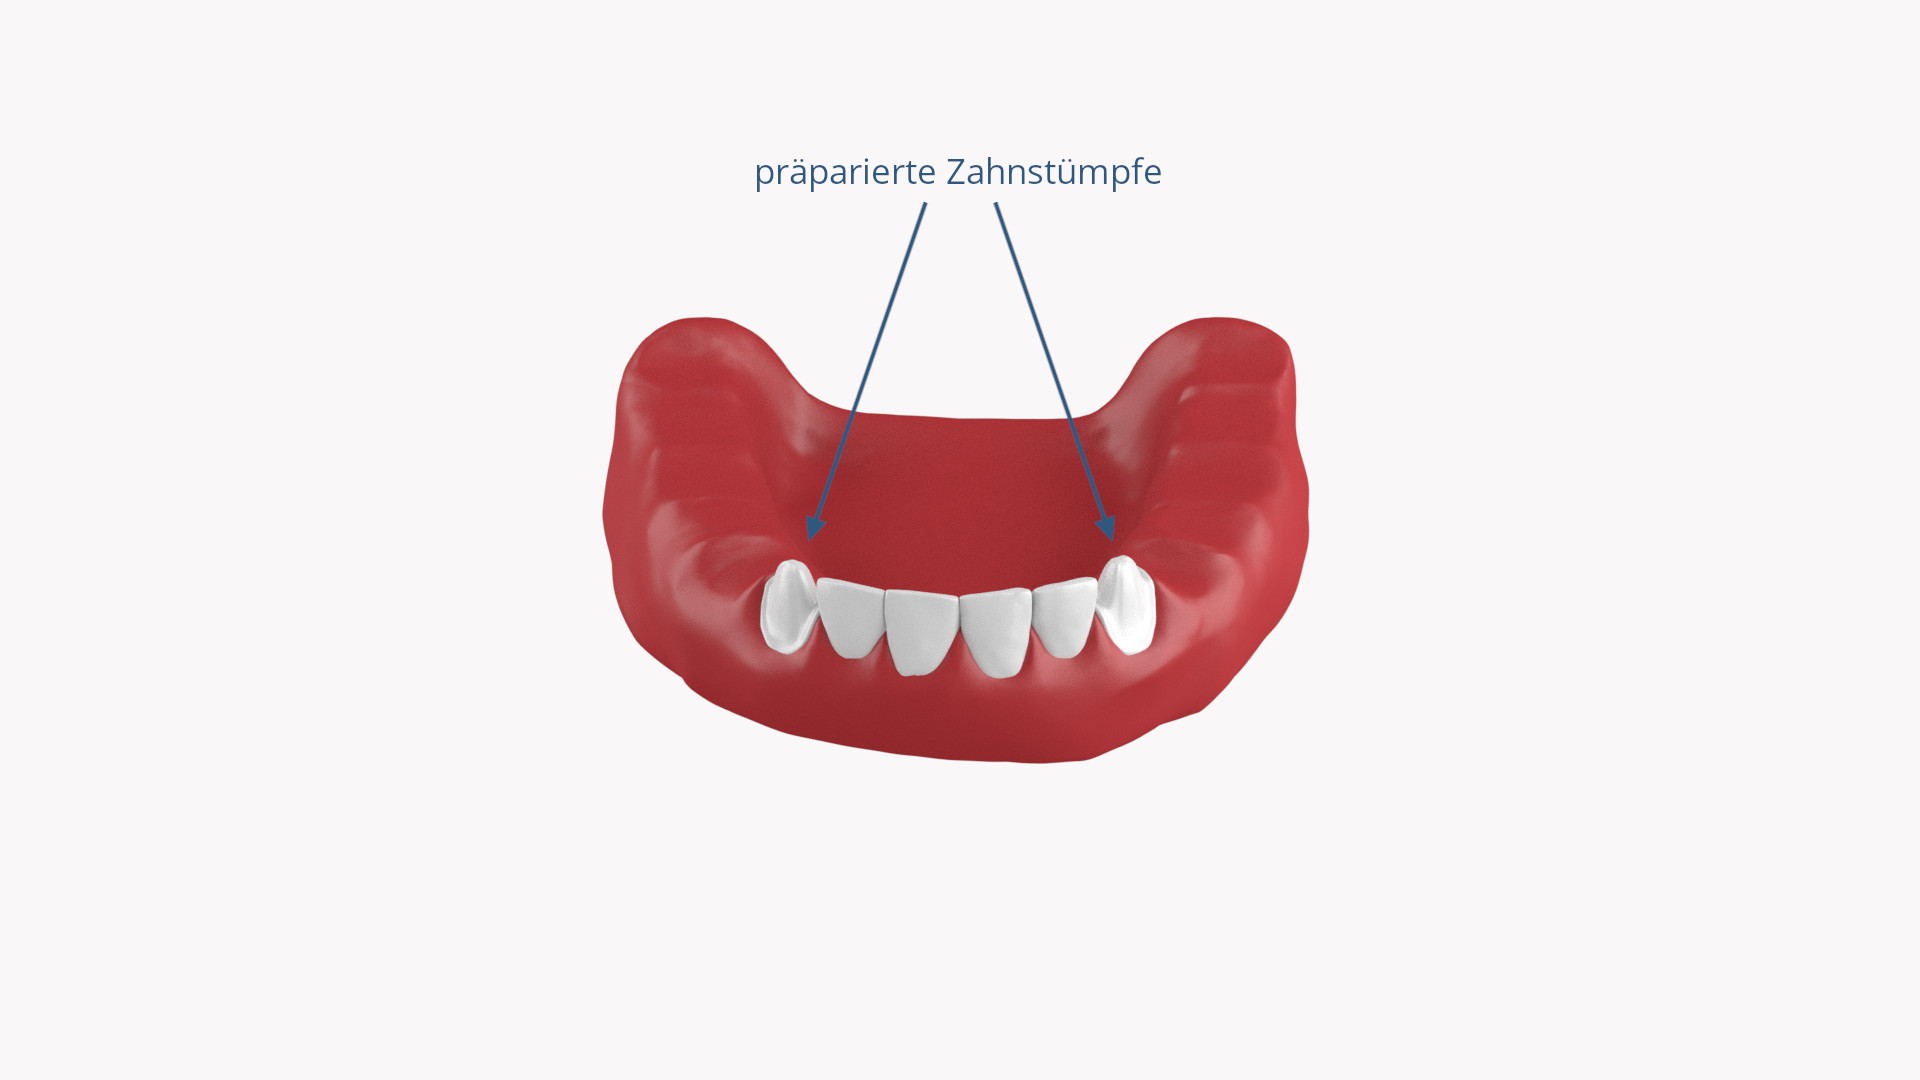 Präparierter Zahnstumpf